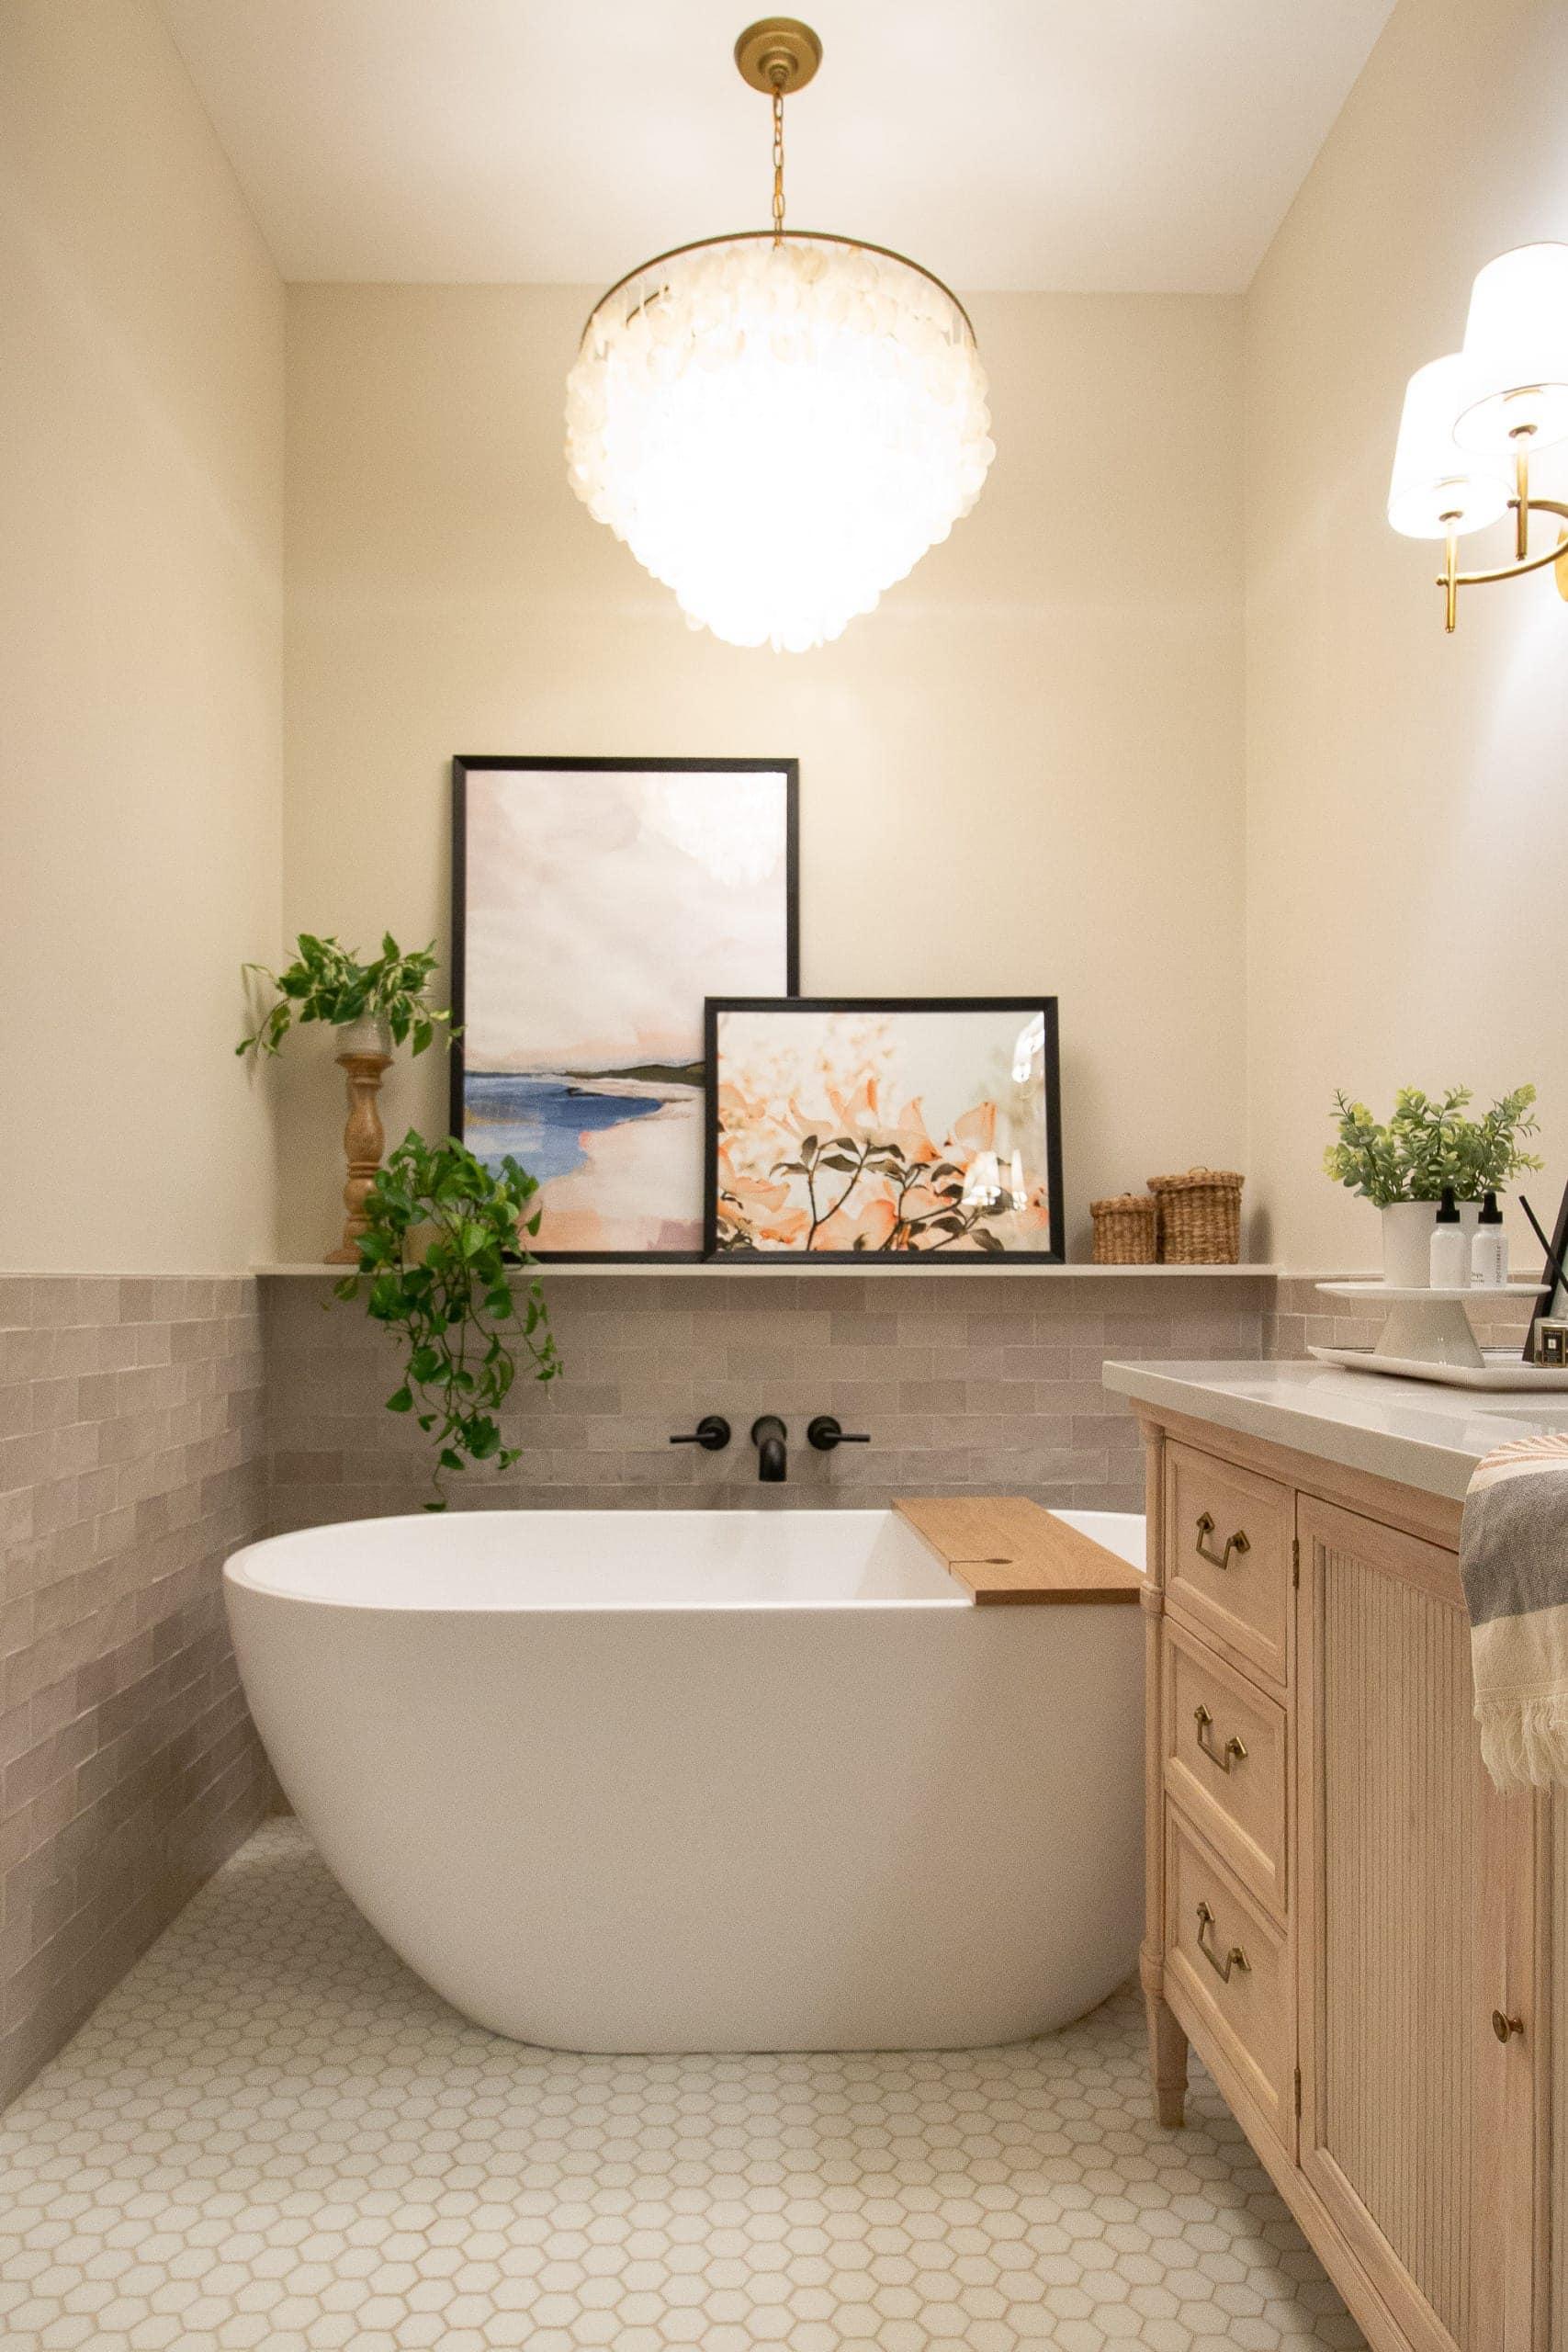 Jan's main bathroom freestanding tub